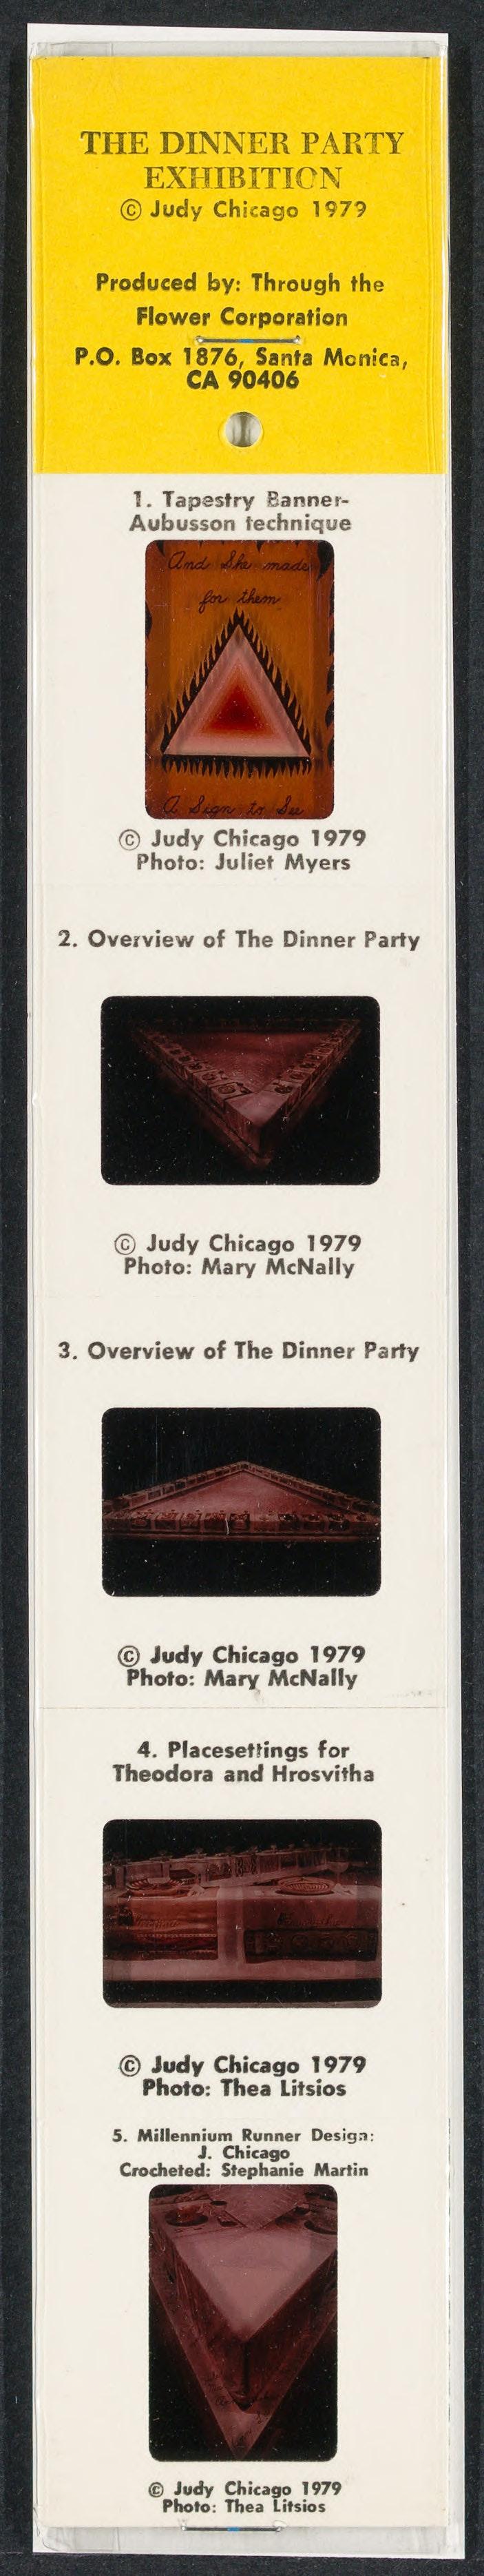 Slide set of the Dinner Party